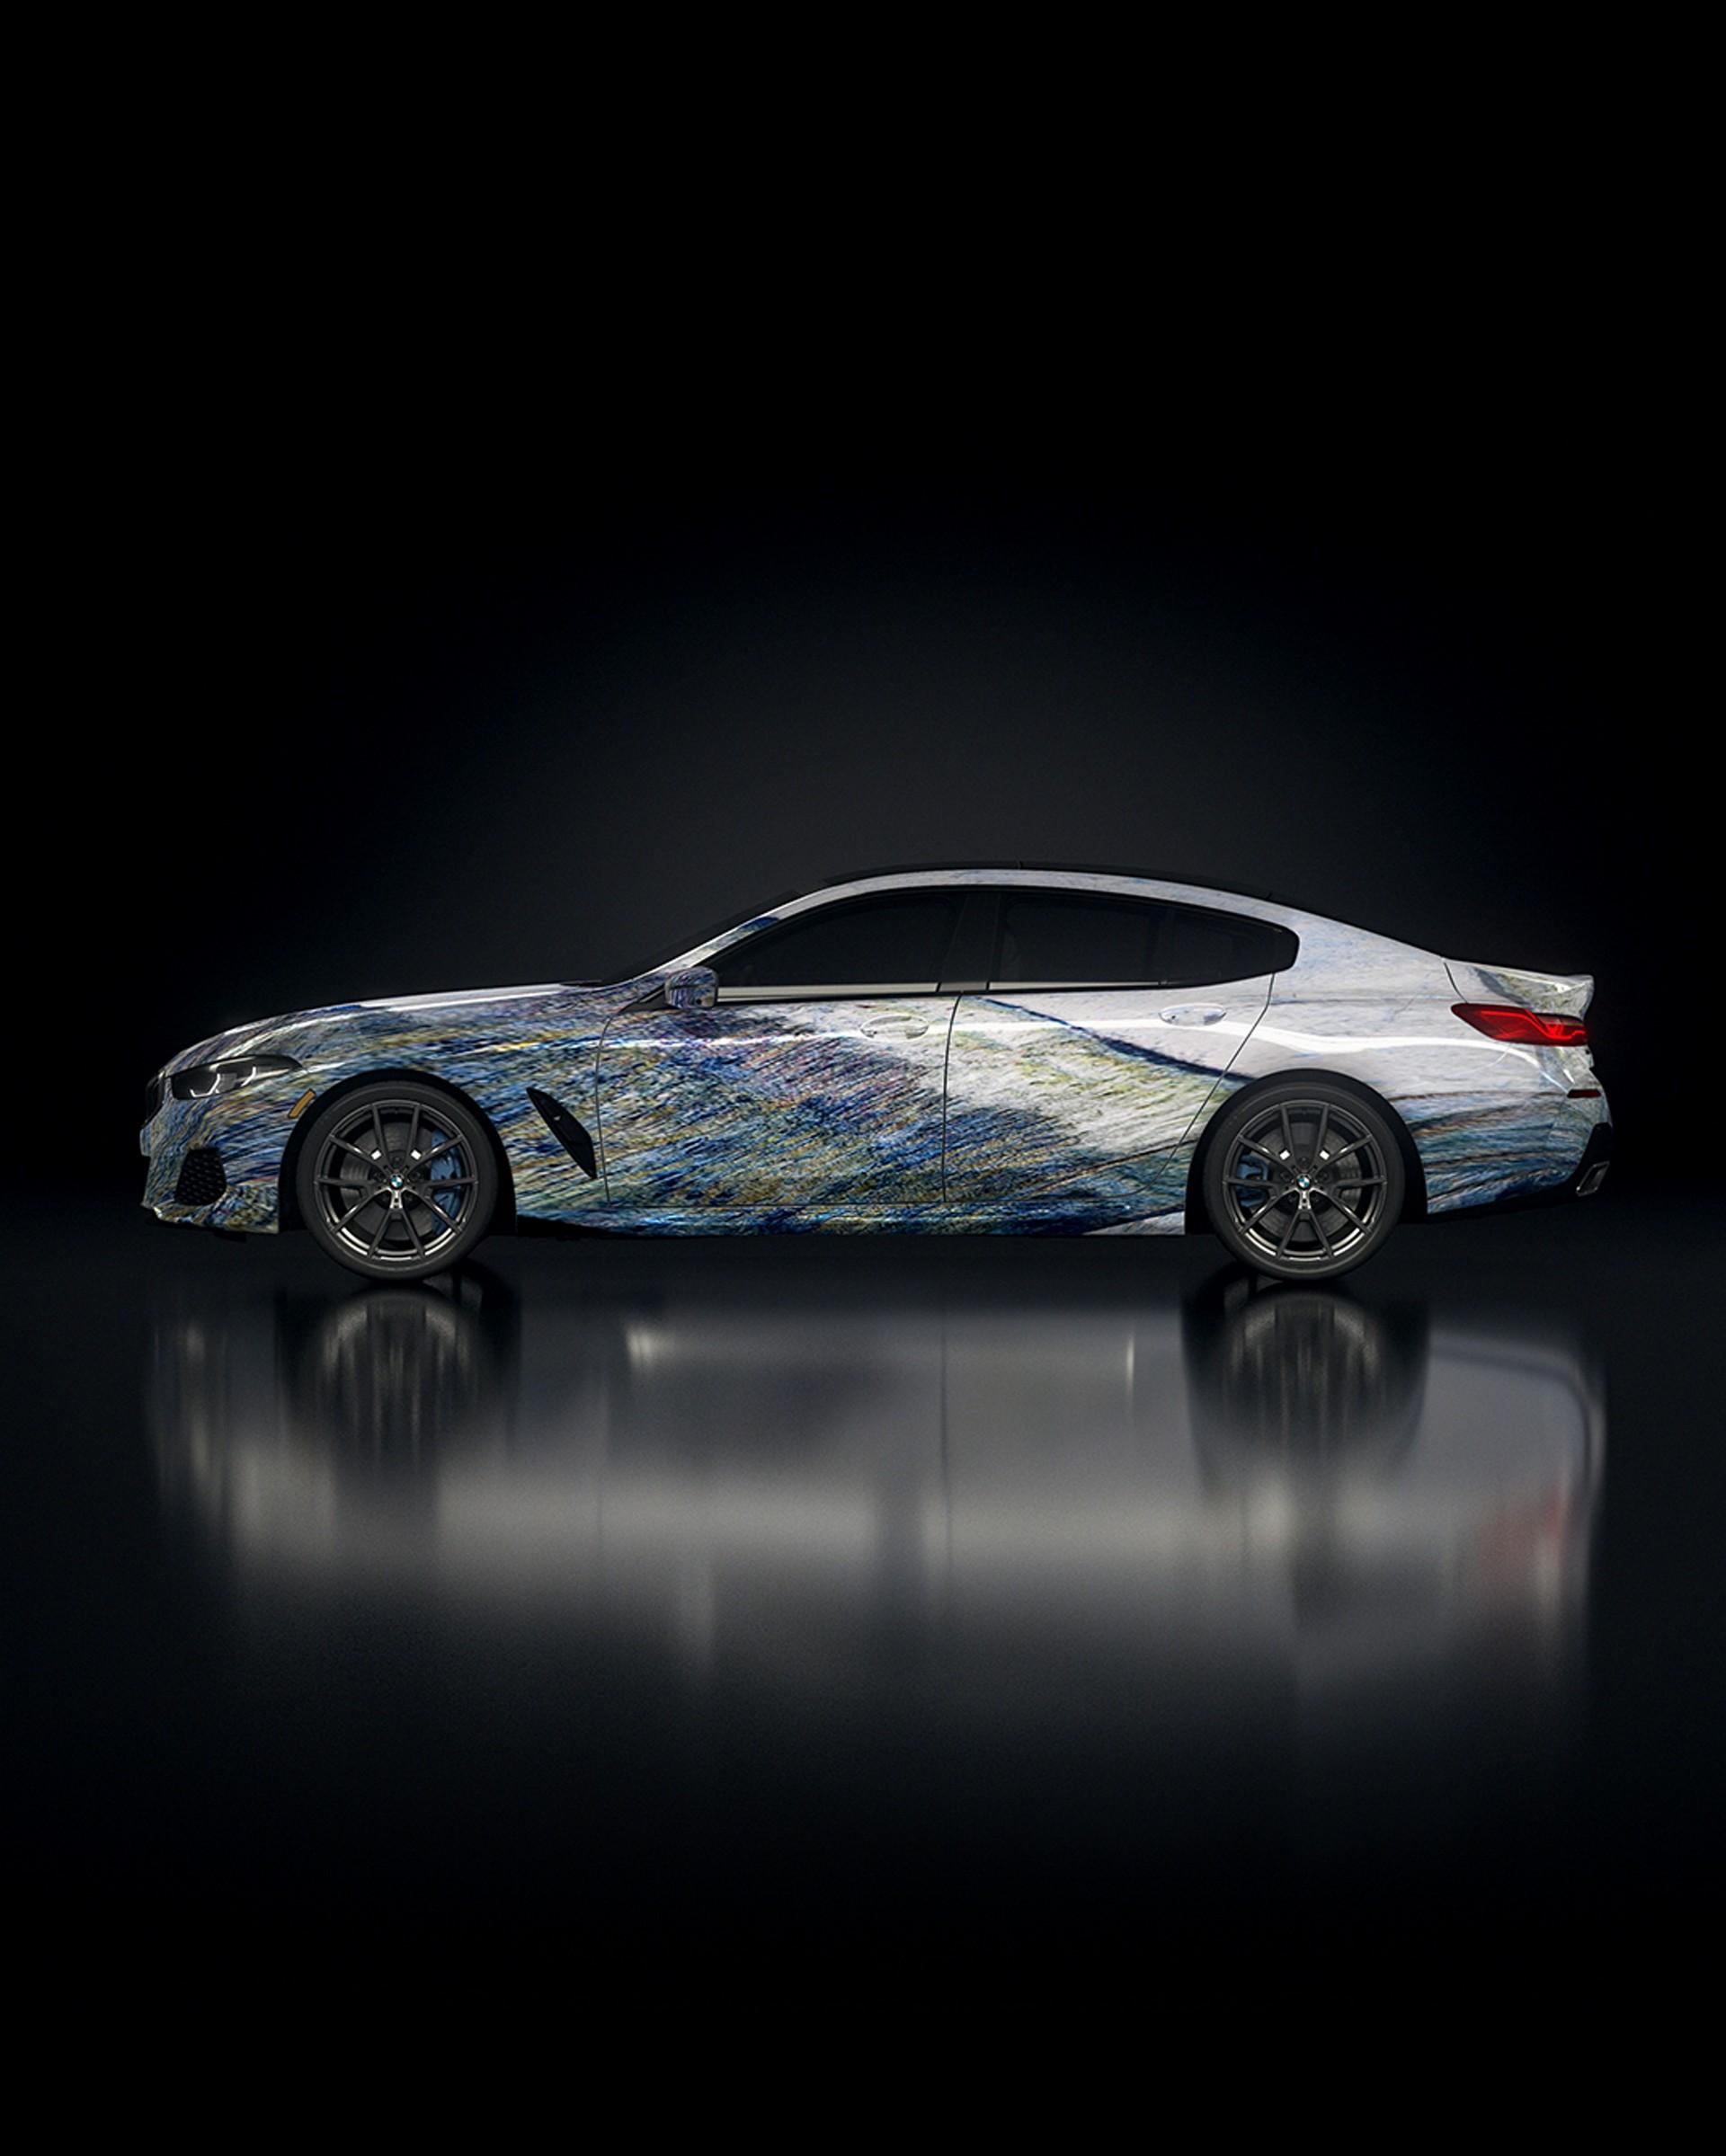 BMW-8-Series-Gran-Coupe-art-car-12